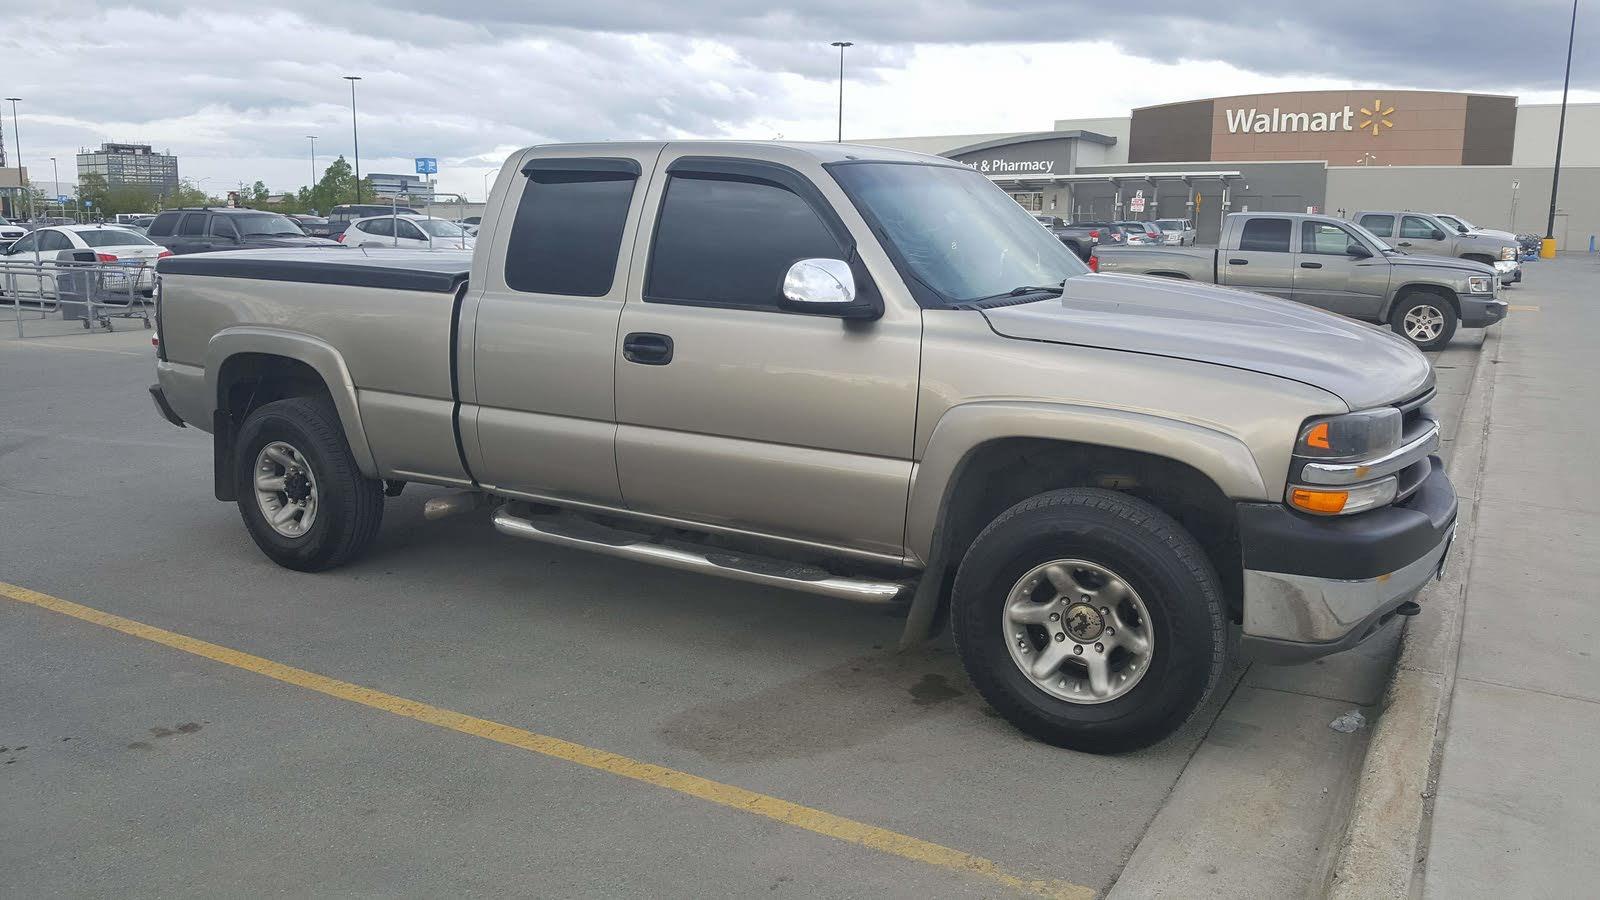 Chevrolet Silverado 2500HD Questions - Chevy Silverado 2500 hd, 8.1 ltr 496 Pittman steering ...